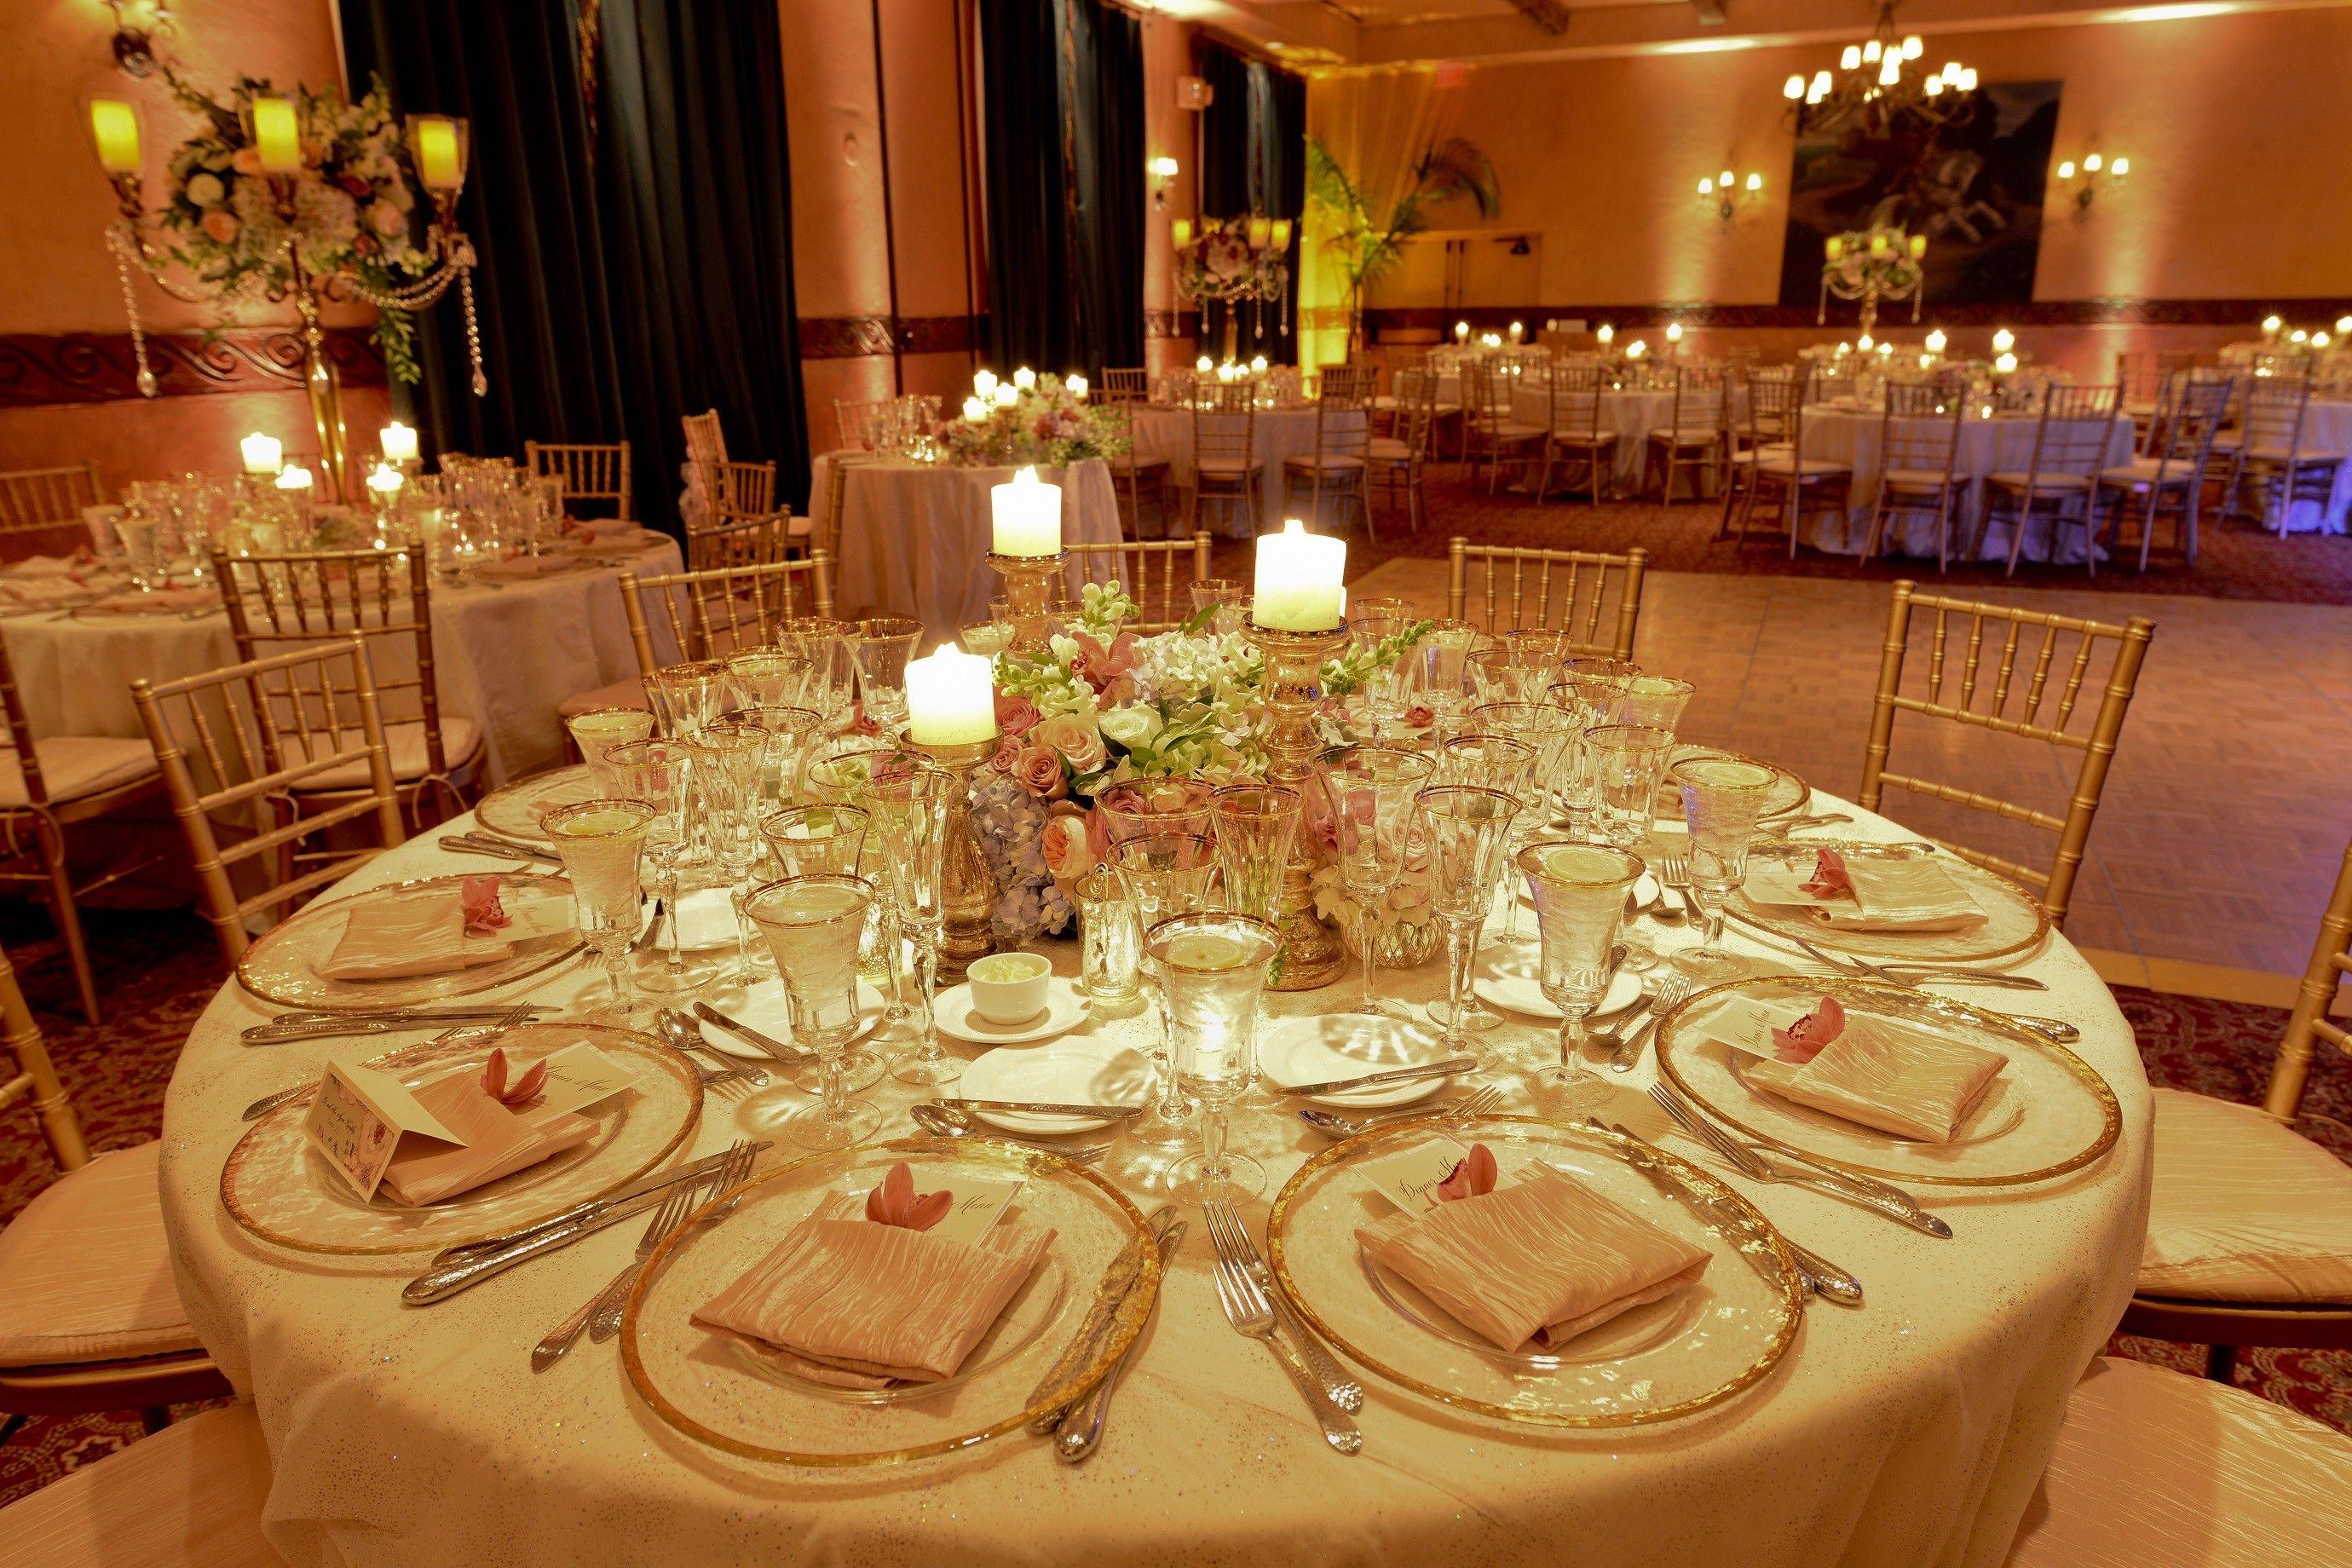 Unique Wedding Centerpiece Ideas With Candles For Romantic Theme ...